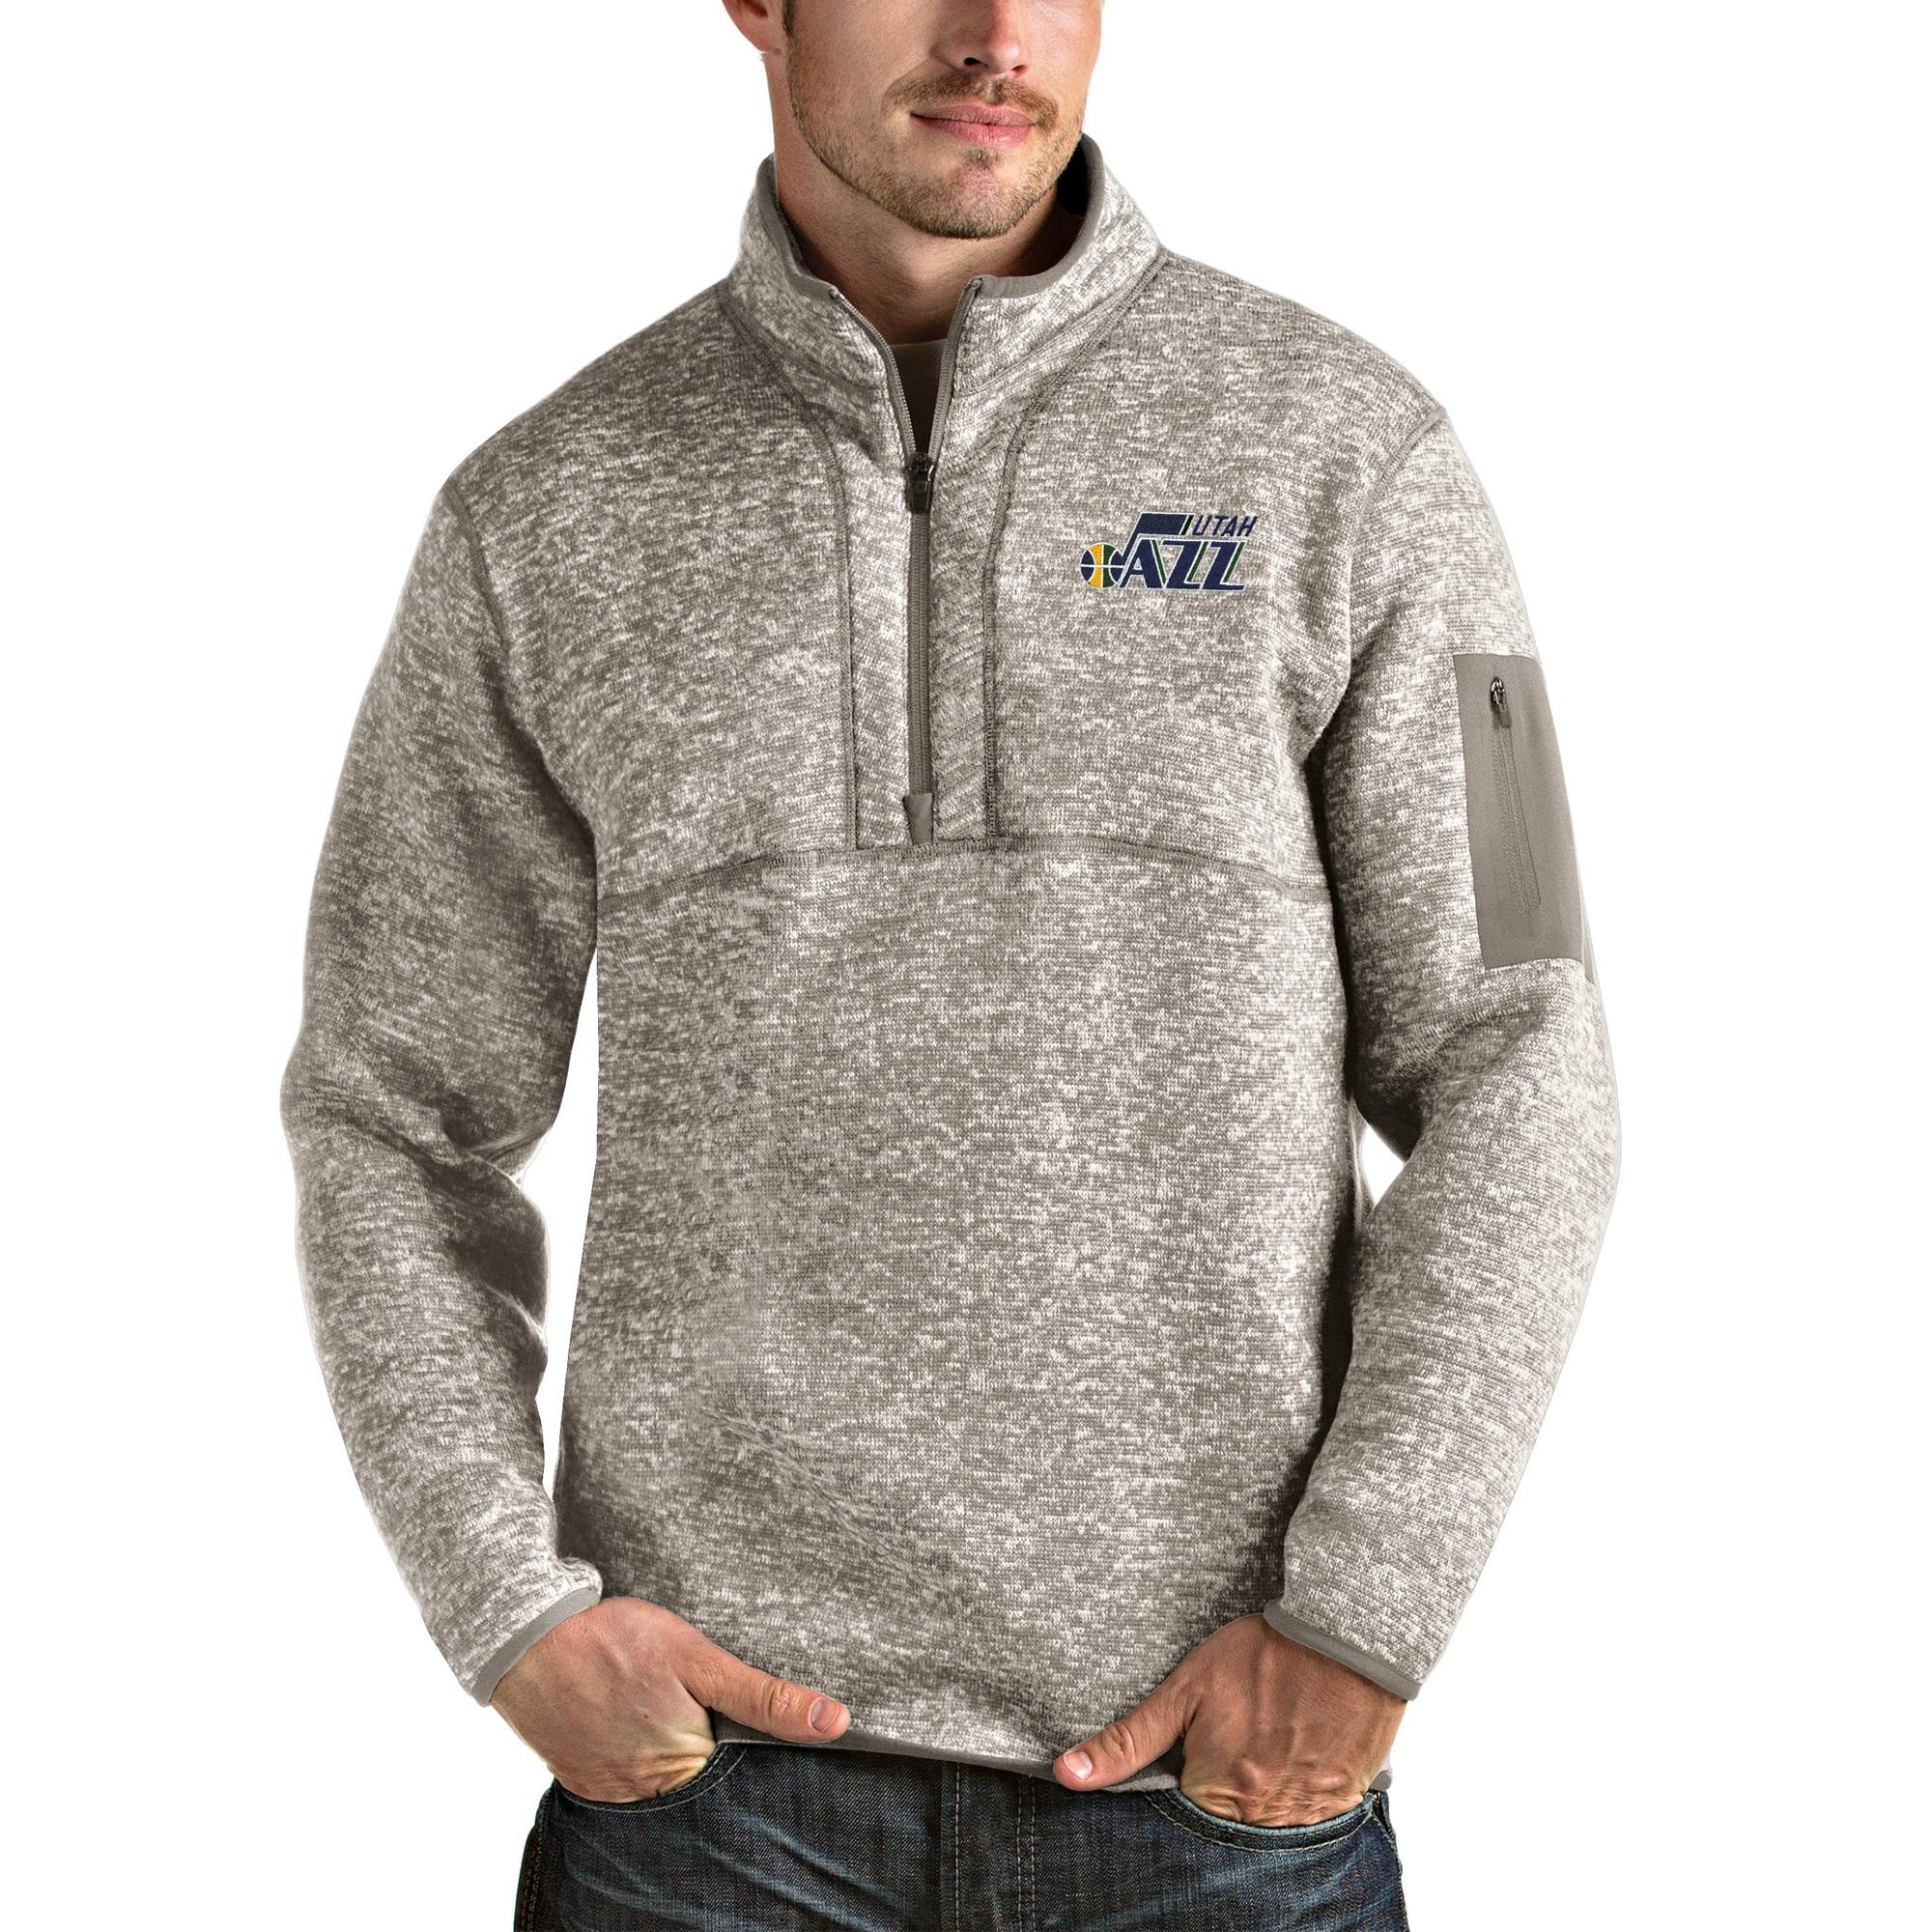 Utah Jazz Antigua Fortune Quarter-Zip Pullover Jacket - Natural